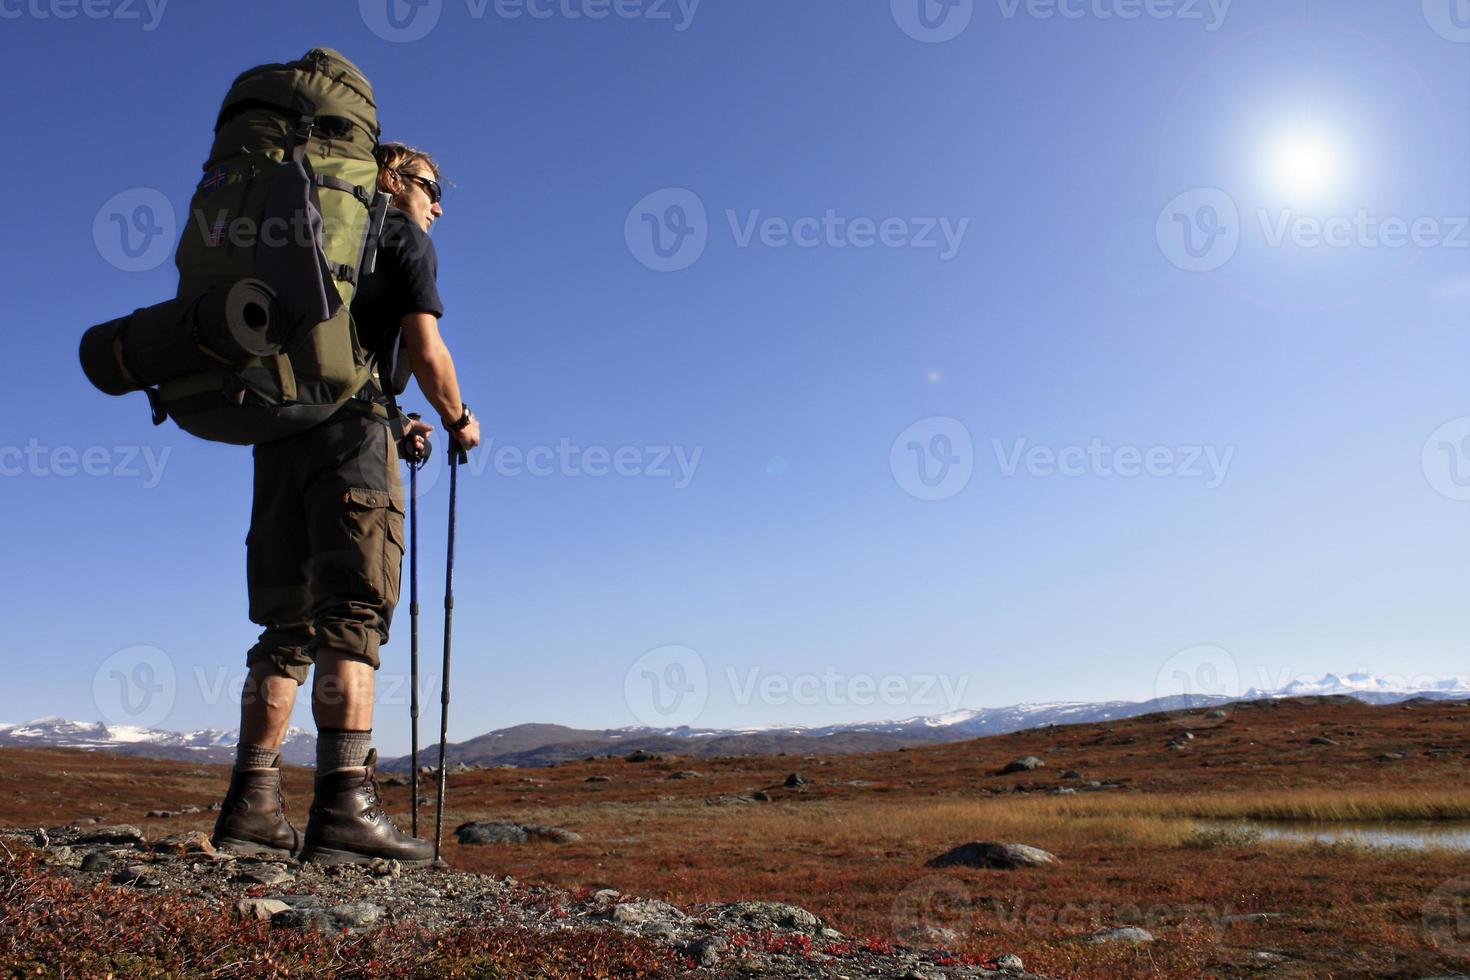 vandrare på turné foto